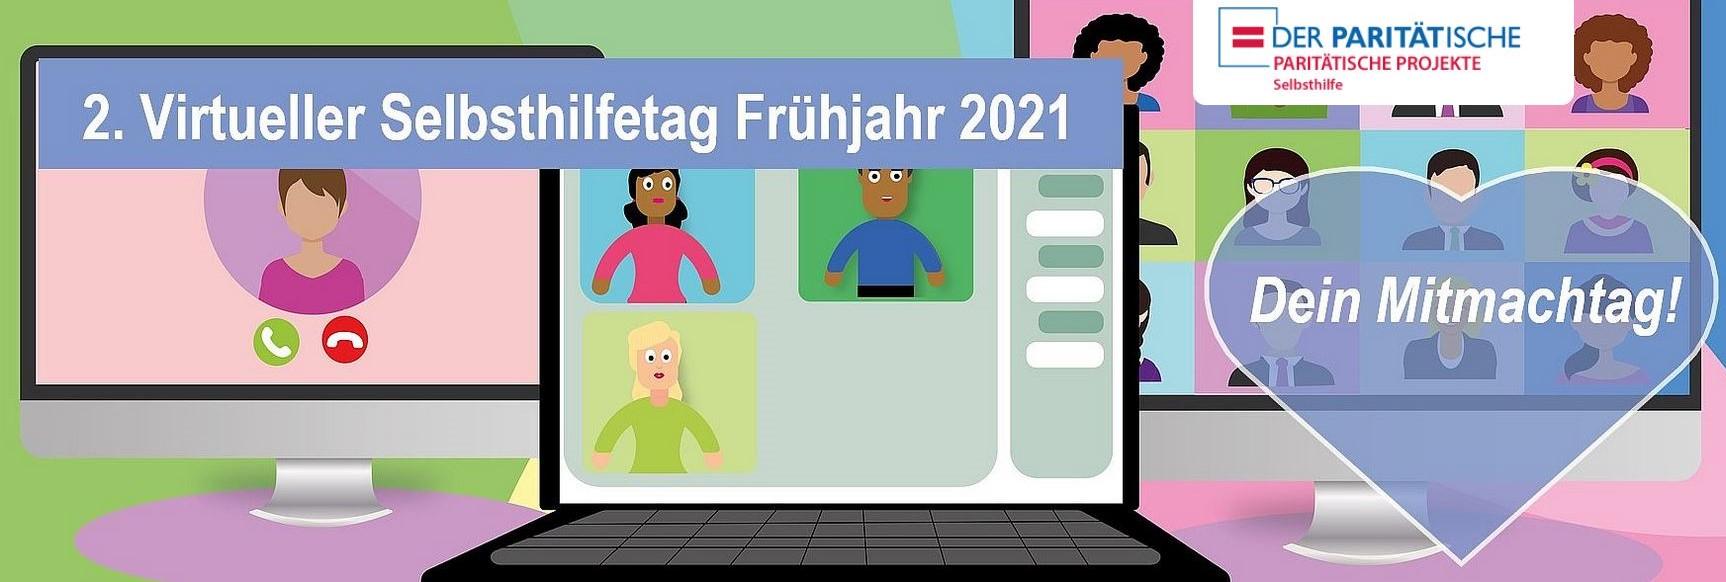 2. Virtueller Selbsthilfetag am 26. und 27. März 2021